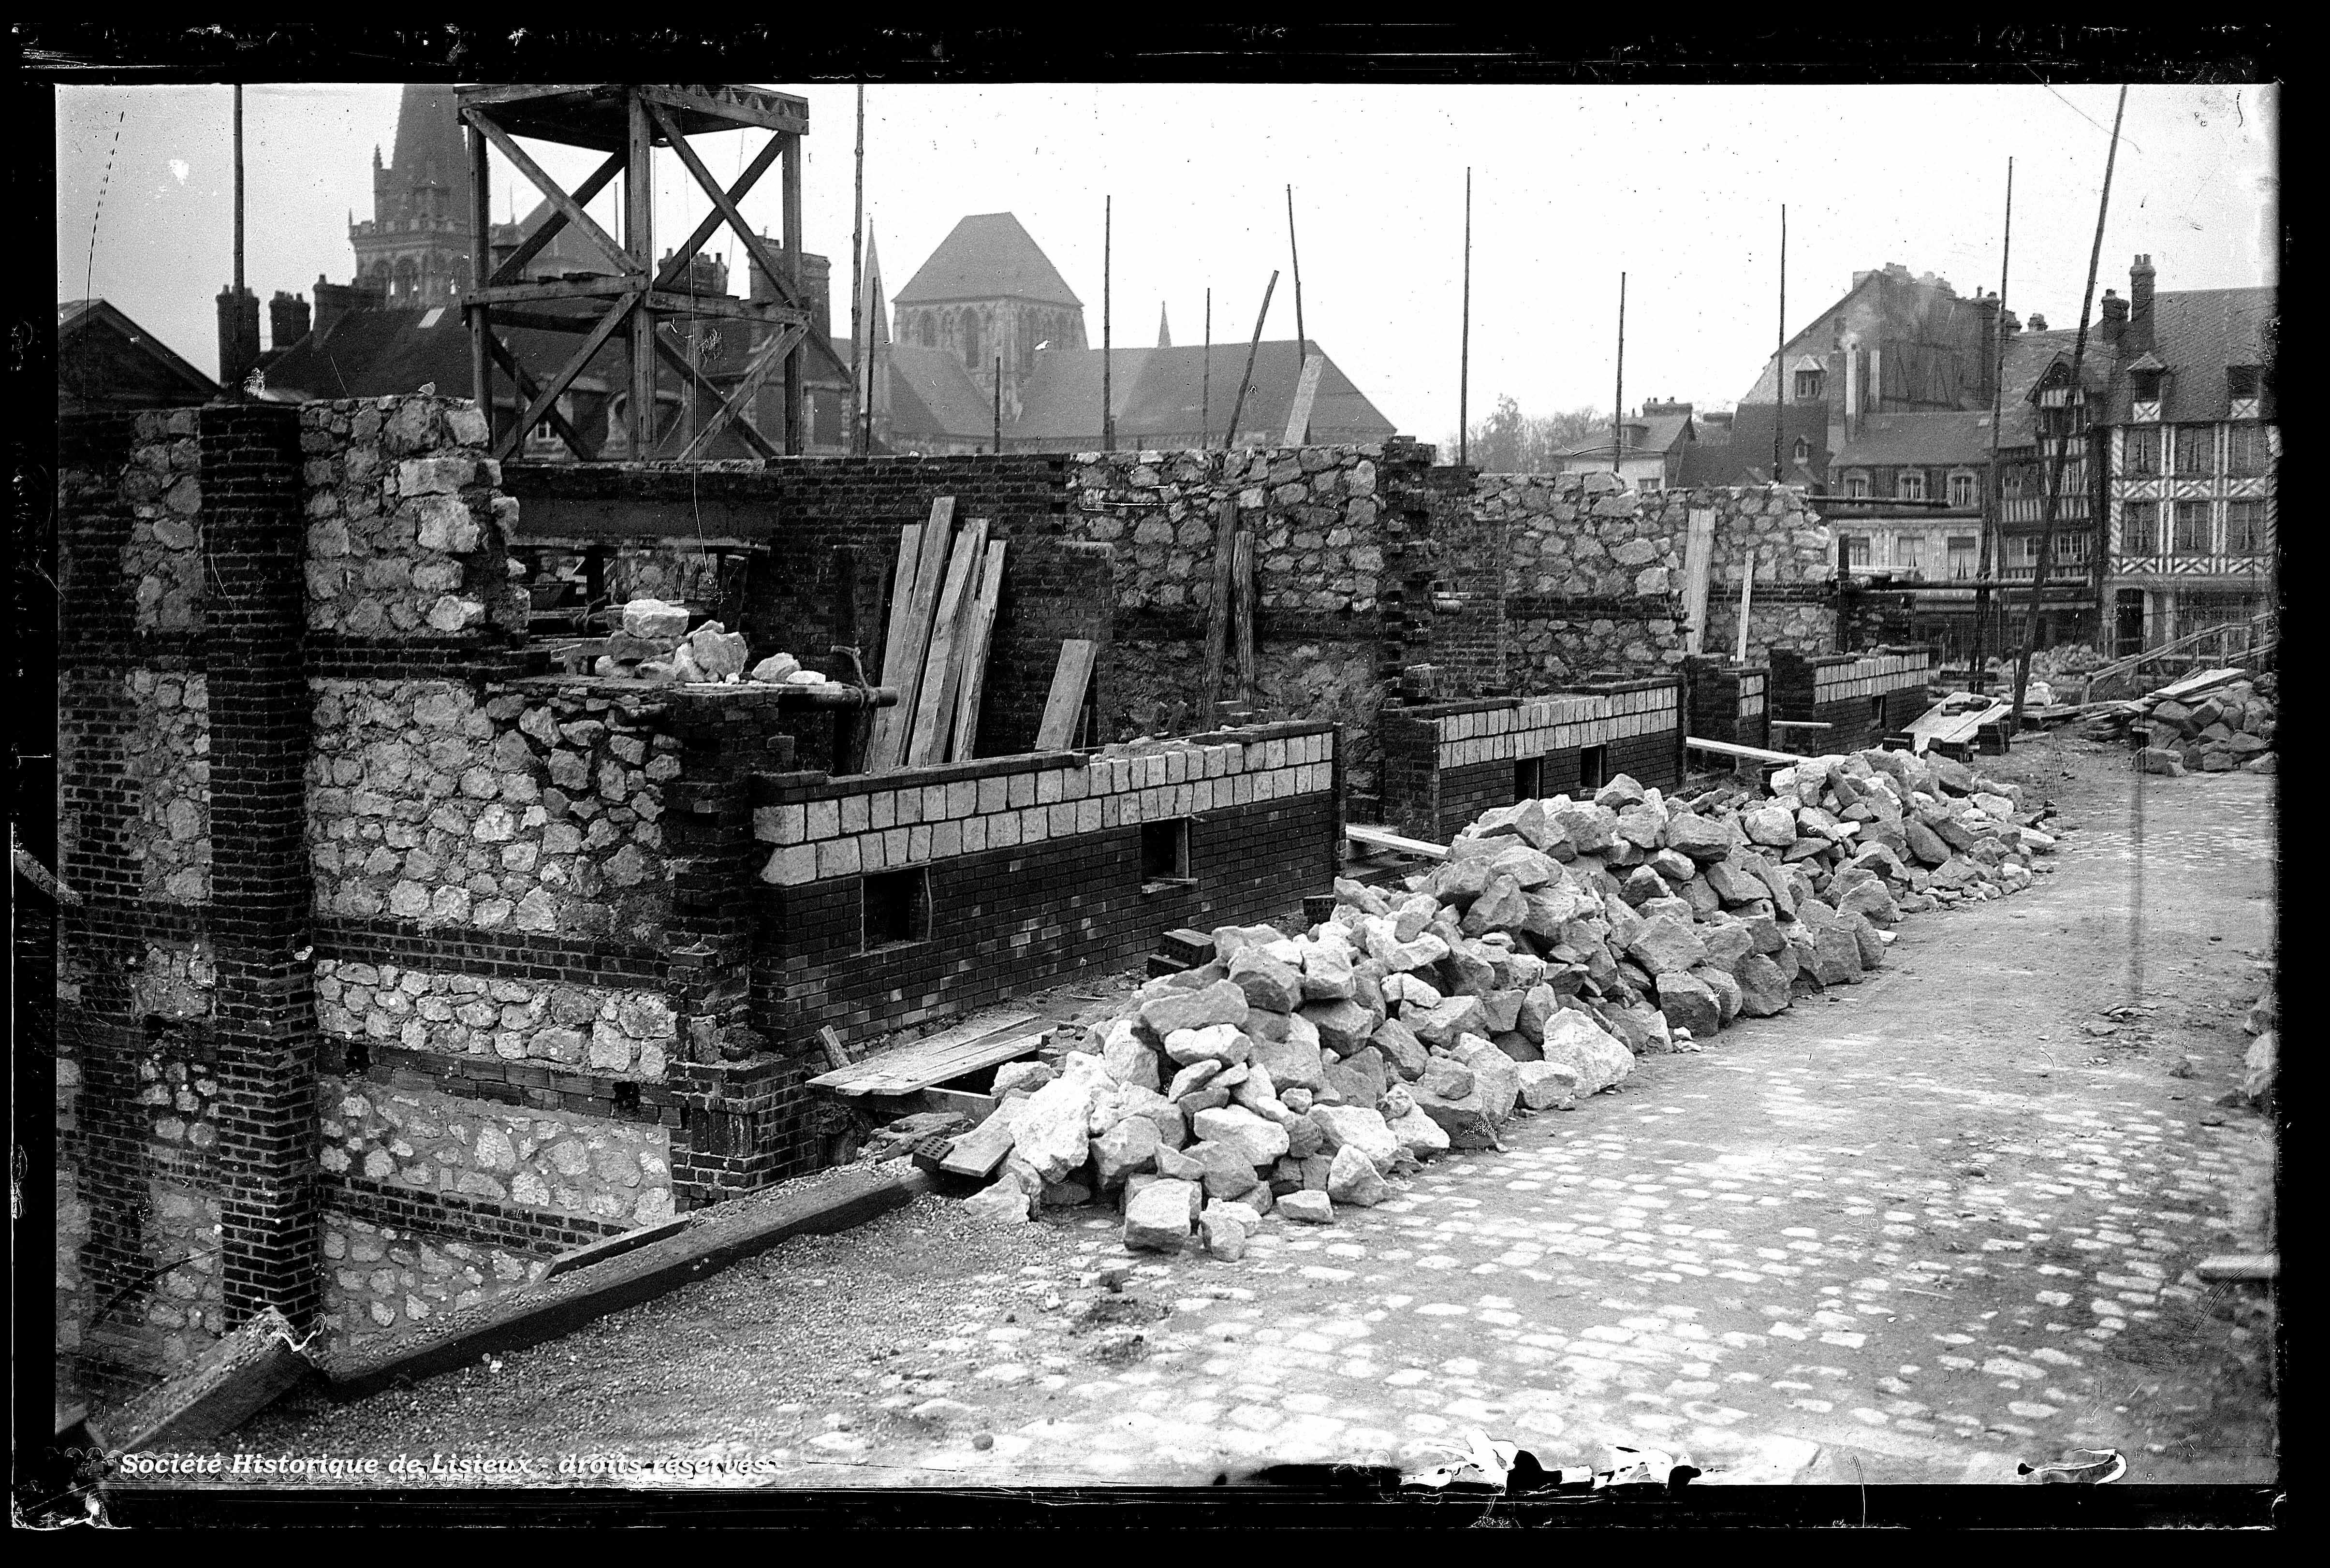 Chantier de construction, rue Aristide-Briand (photos n°563, 1122, 1124 et 1125)